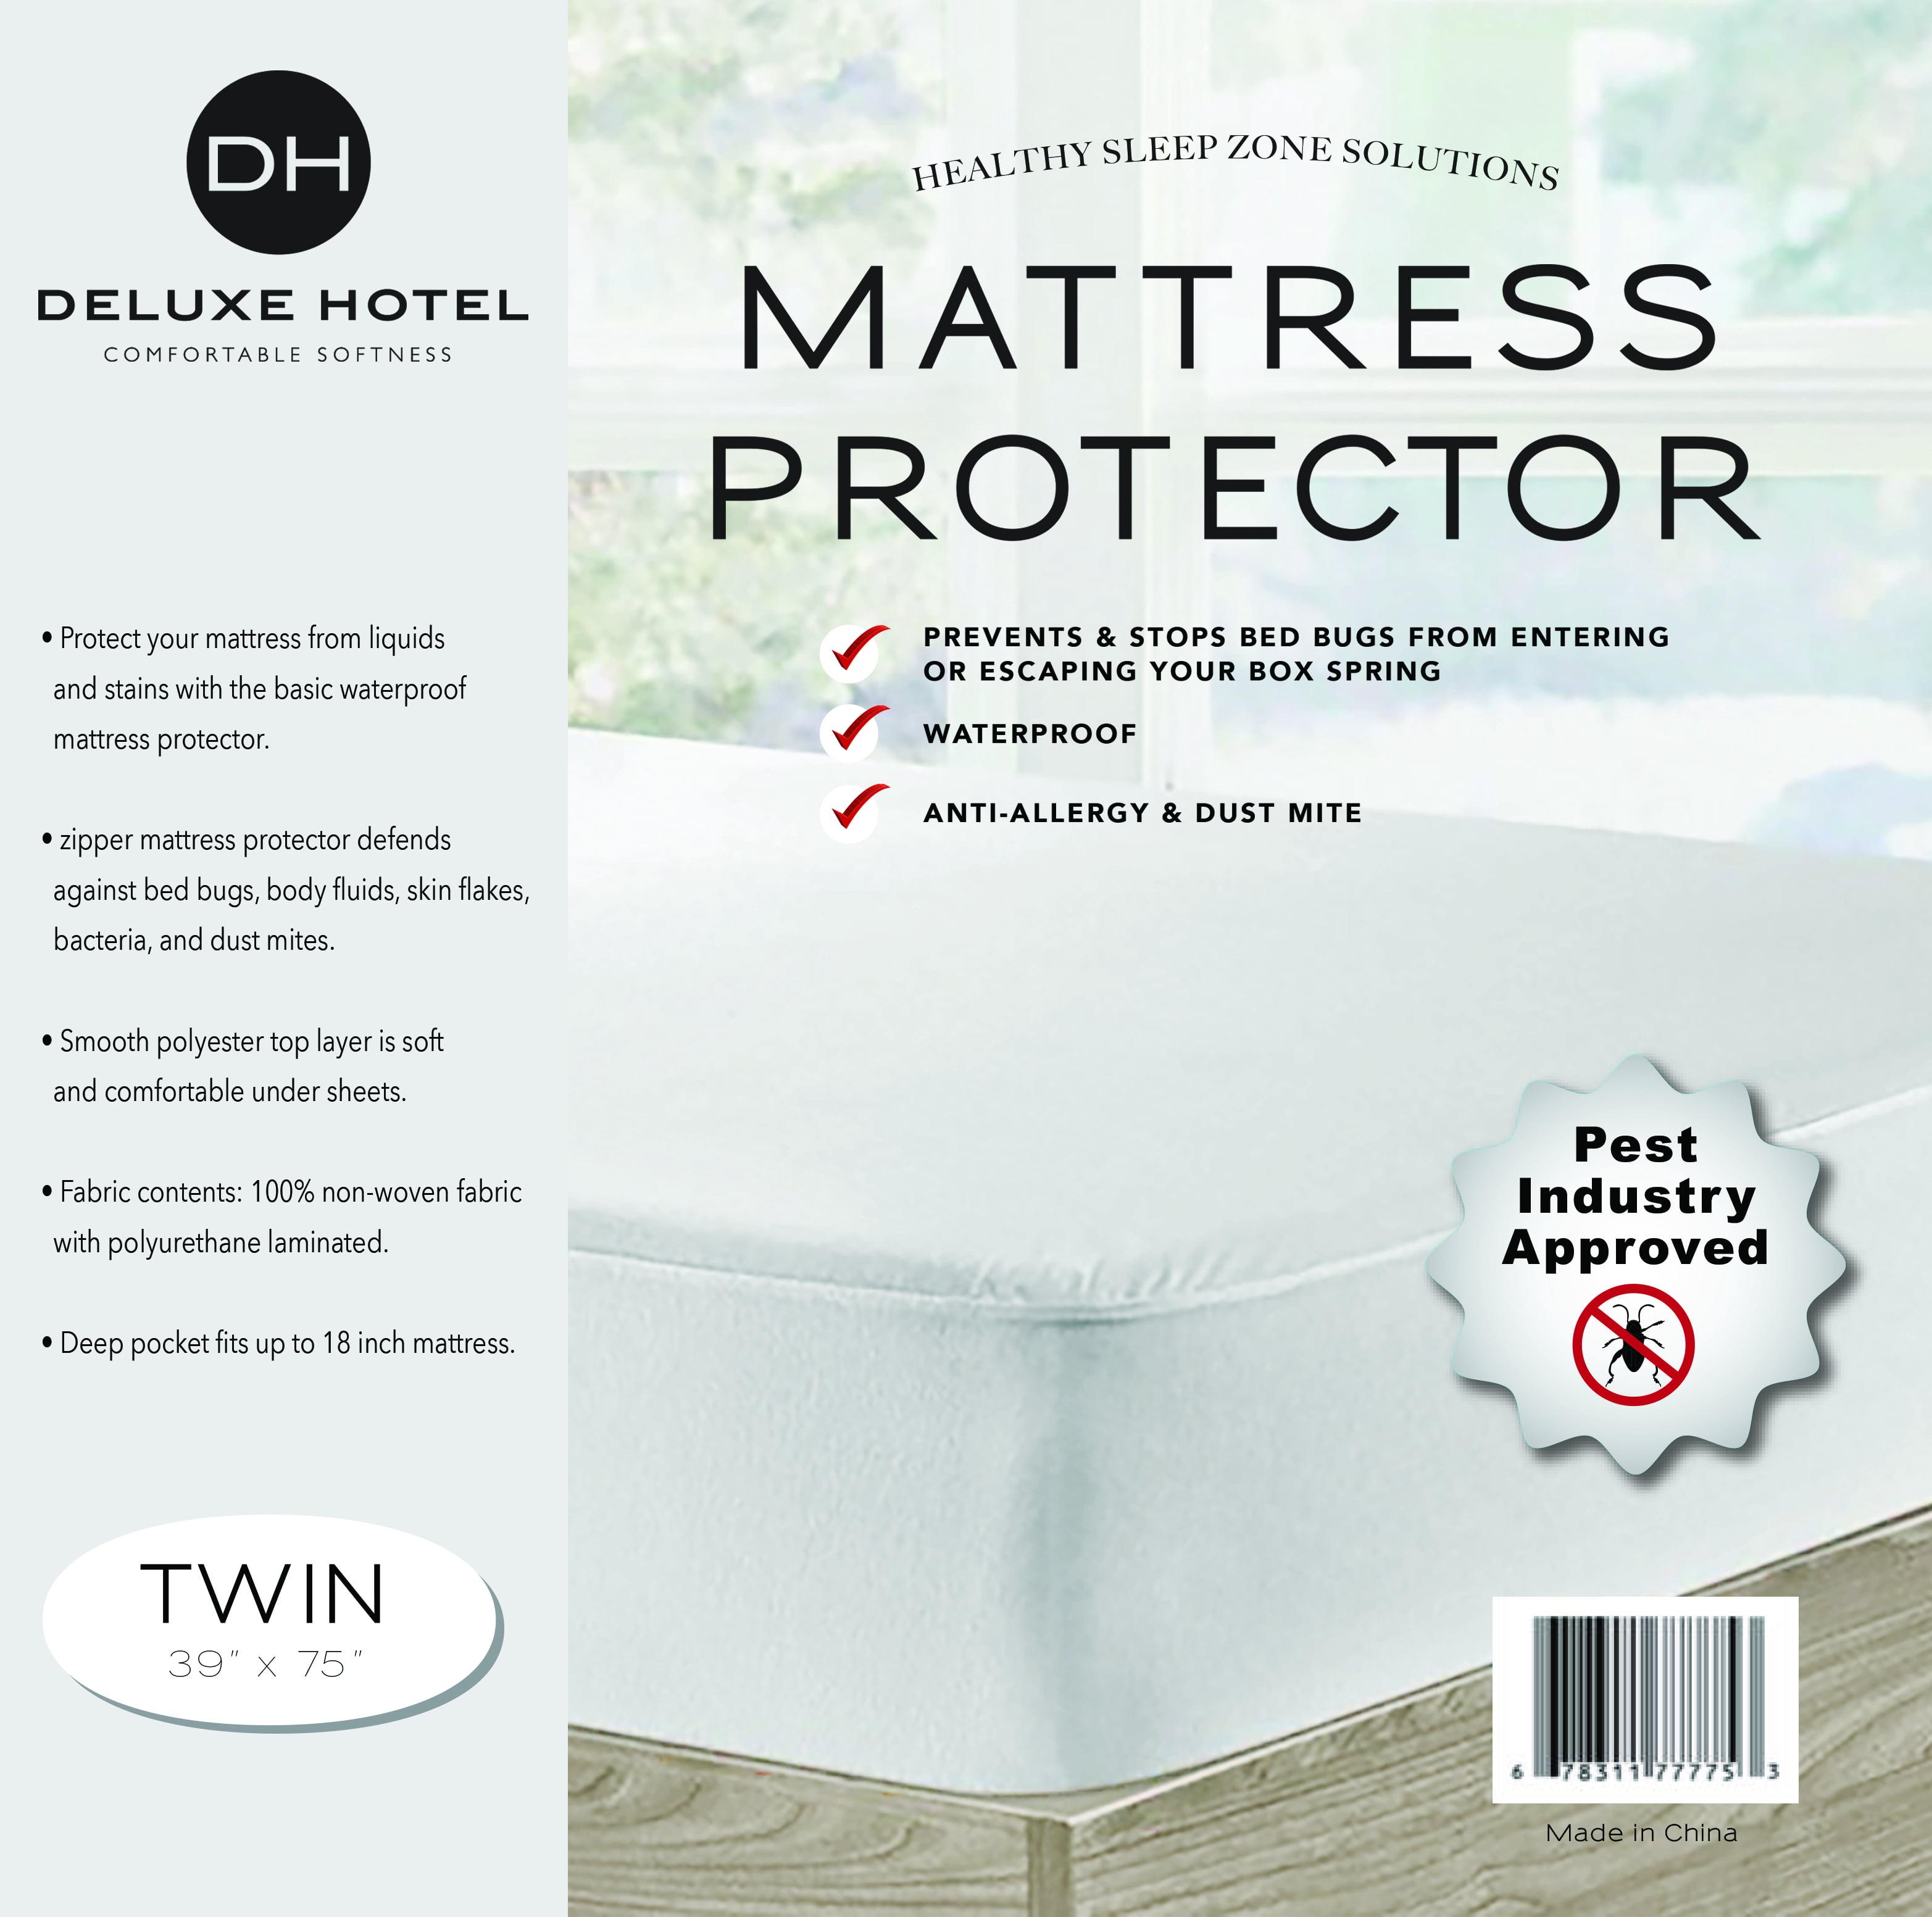 Ultimate Bed Bug Blocker Zippered Waterproof Mattress Protector ( Twin ) by